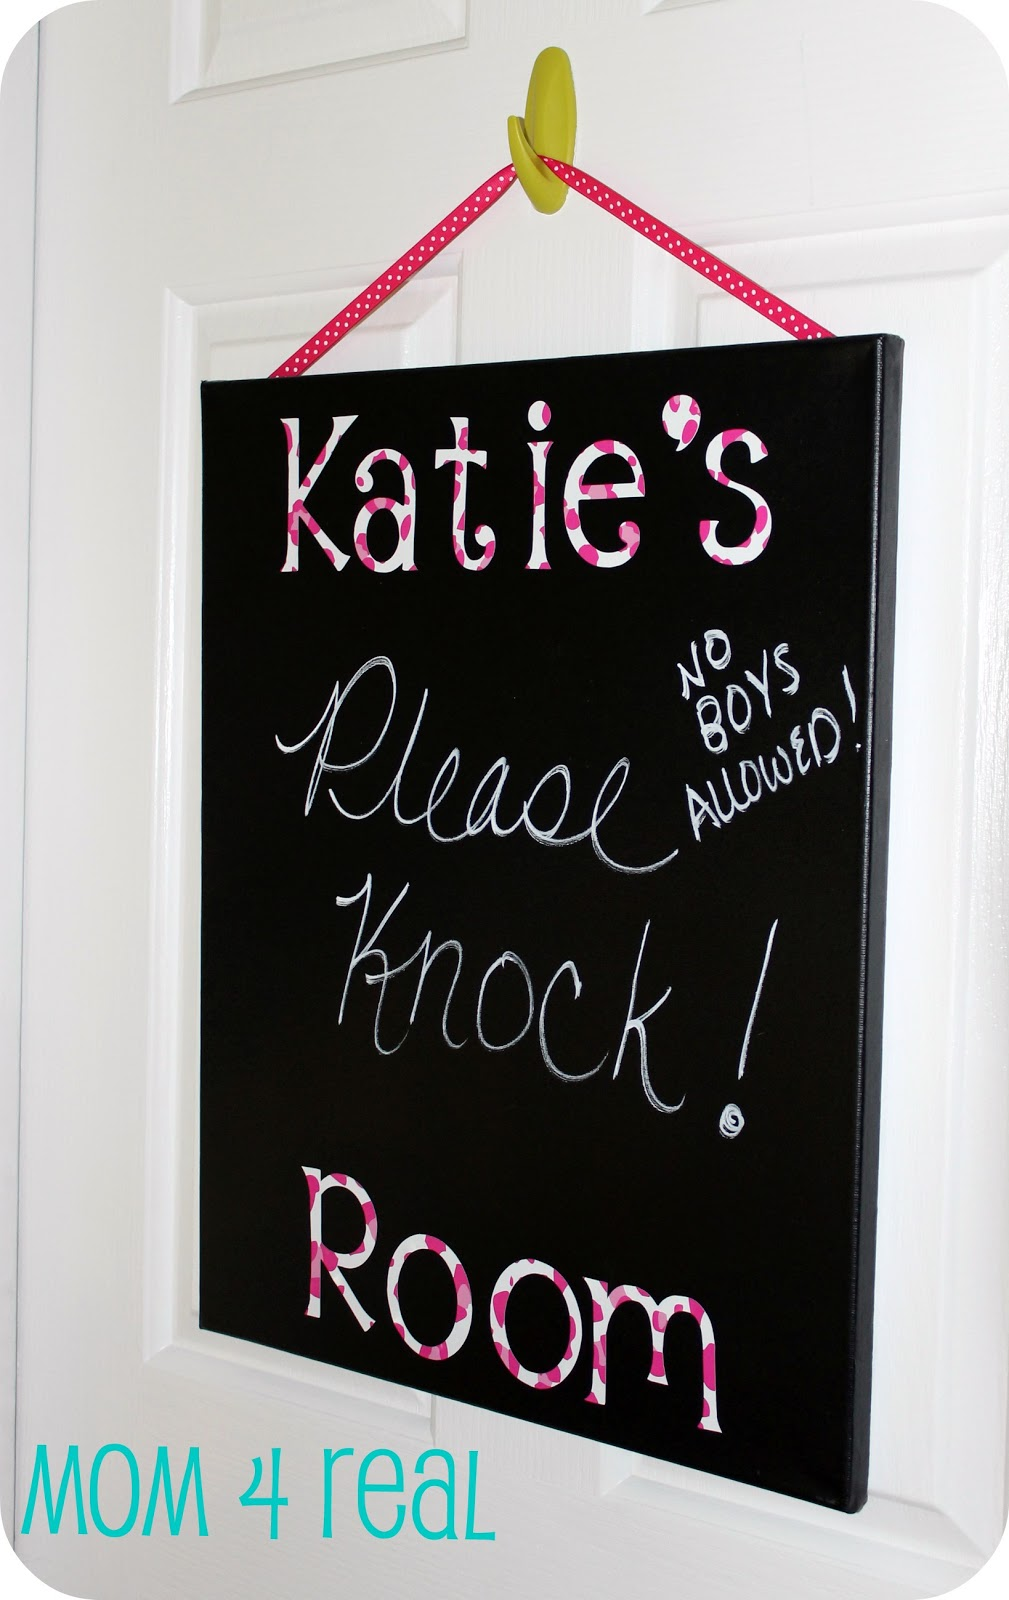 canvas chalkboard w vinyl letters mom 4 real. Black Bedroom Furniture Sets. Home Design Ideas